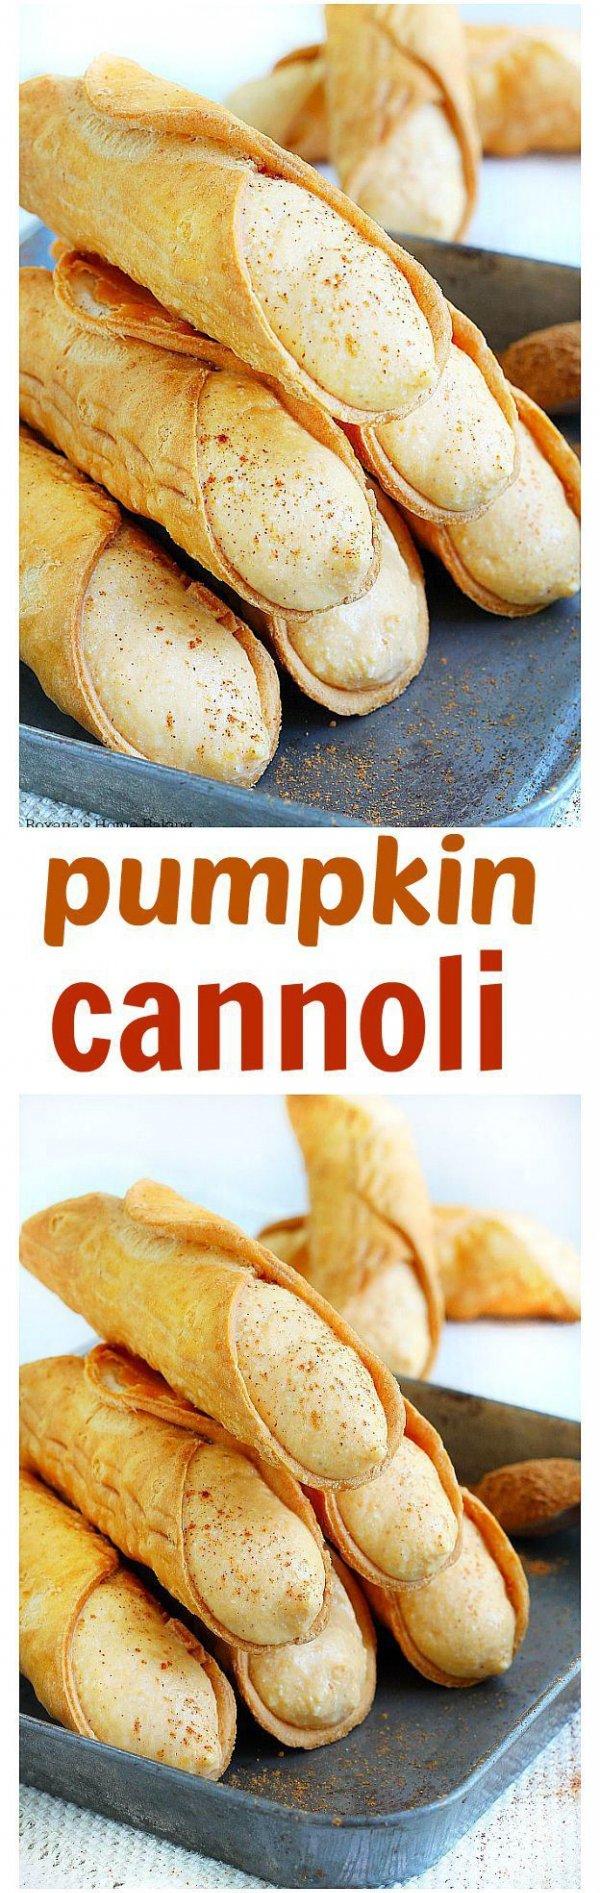 Pumpkin Cannoli